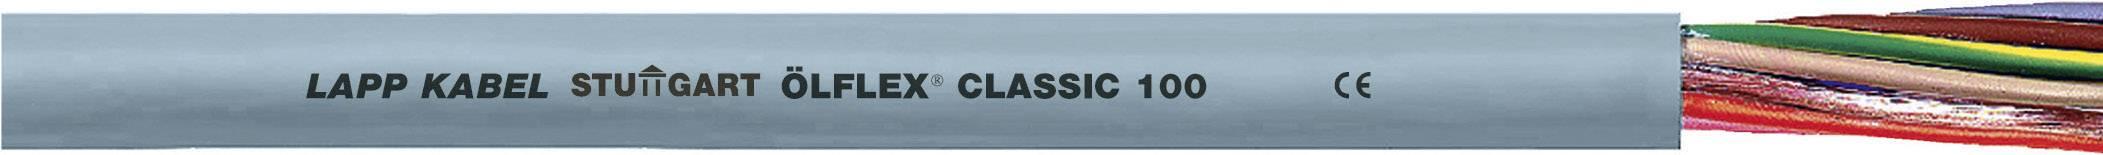 Kabel LappKabel Ölflex CLASSIC 100 2X2,5 (0010086), PVC, 8,9 mm, 750 V, šedá, 500 m